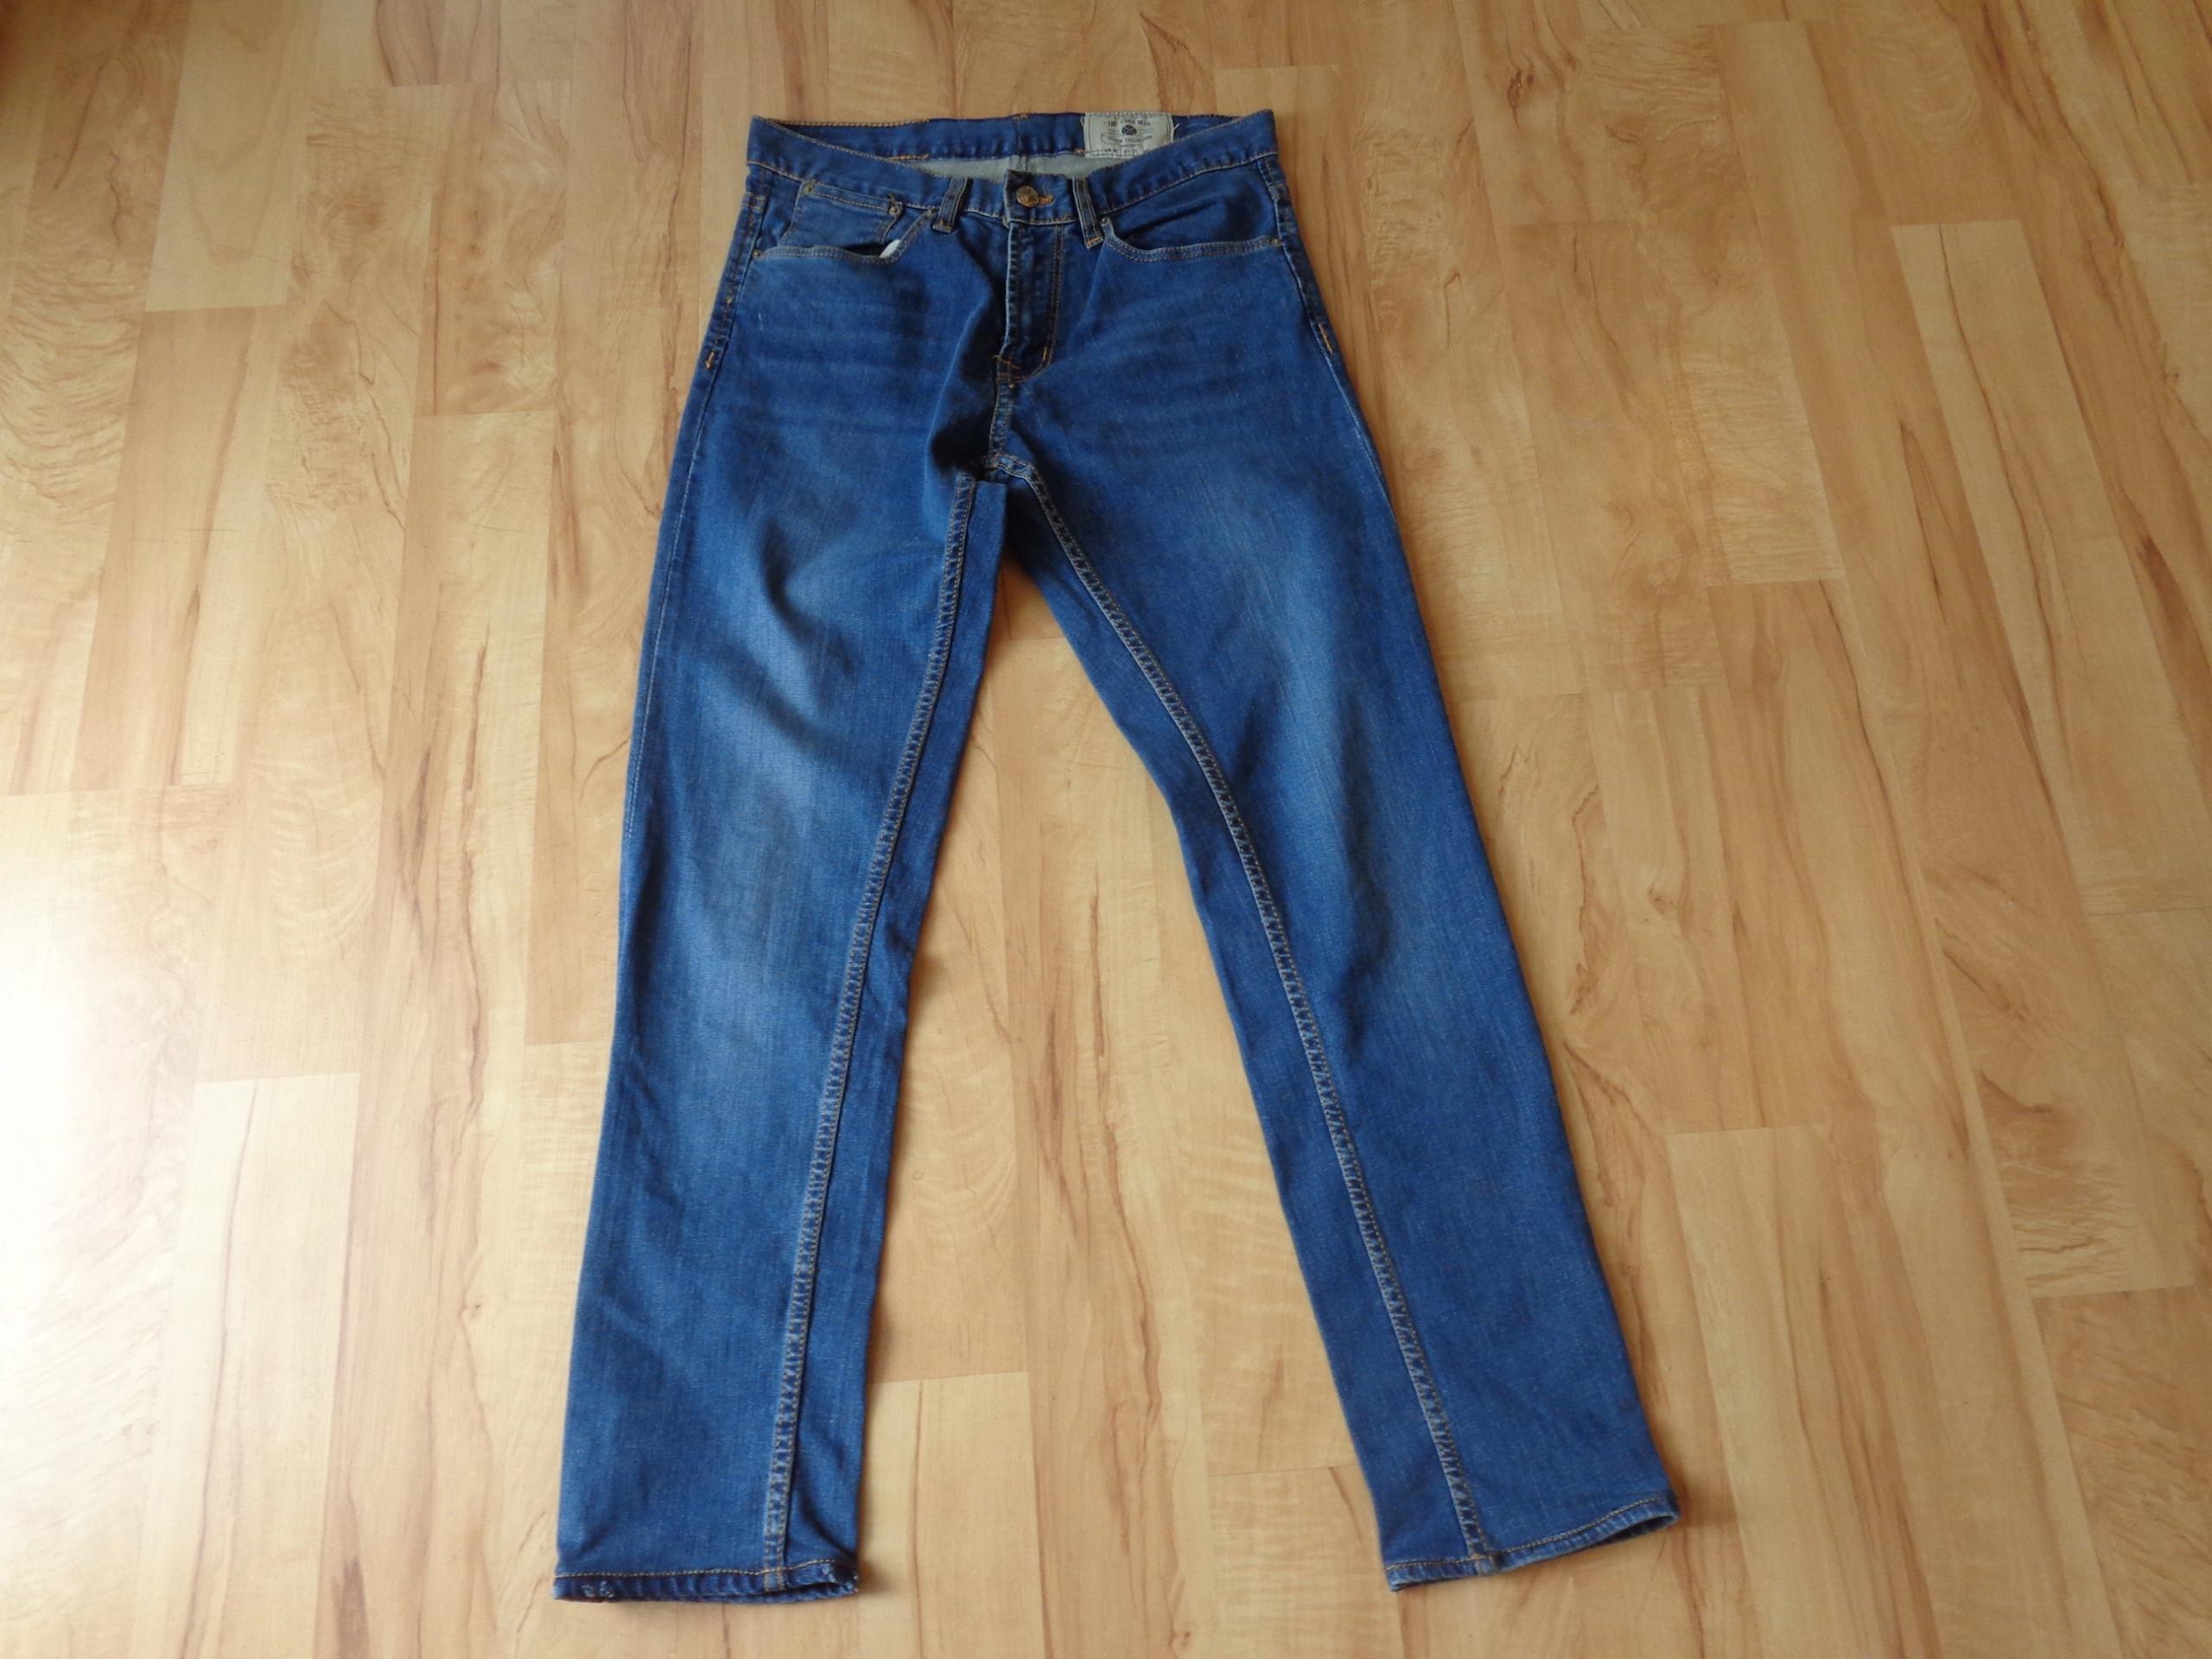 Spodnie ZARA MAN rozmiar 31